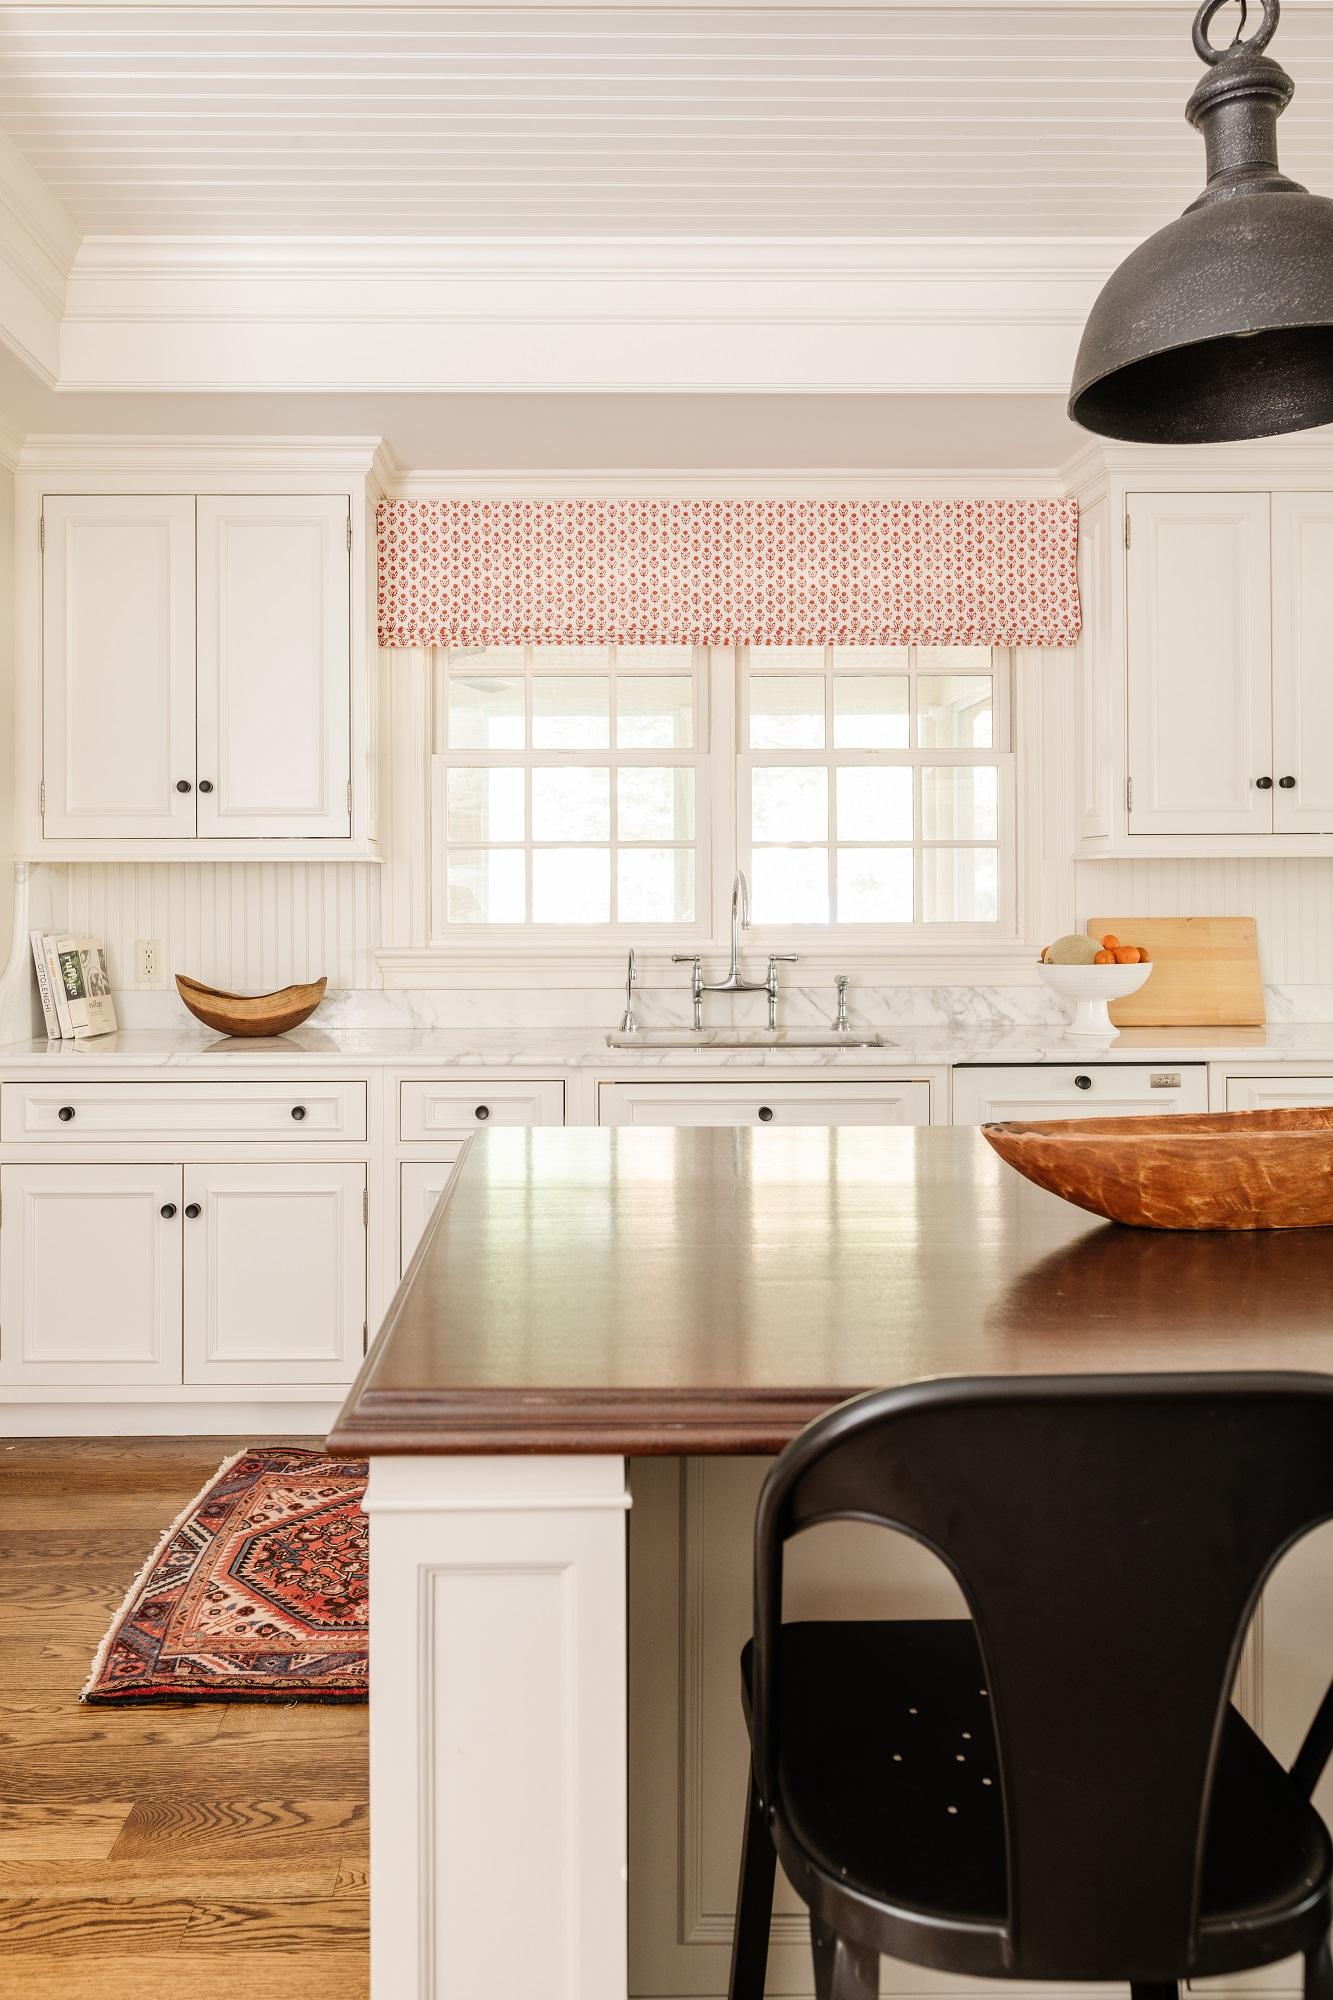 Kitchen design with custom roman shades